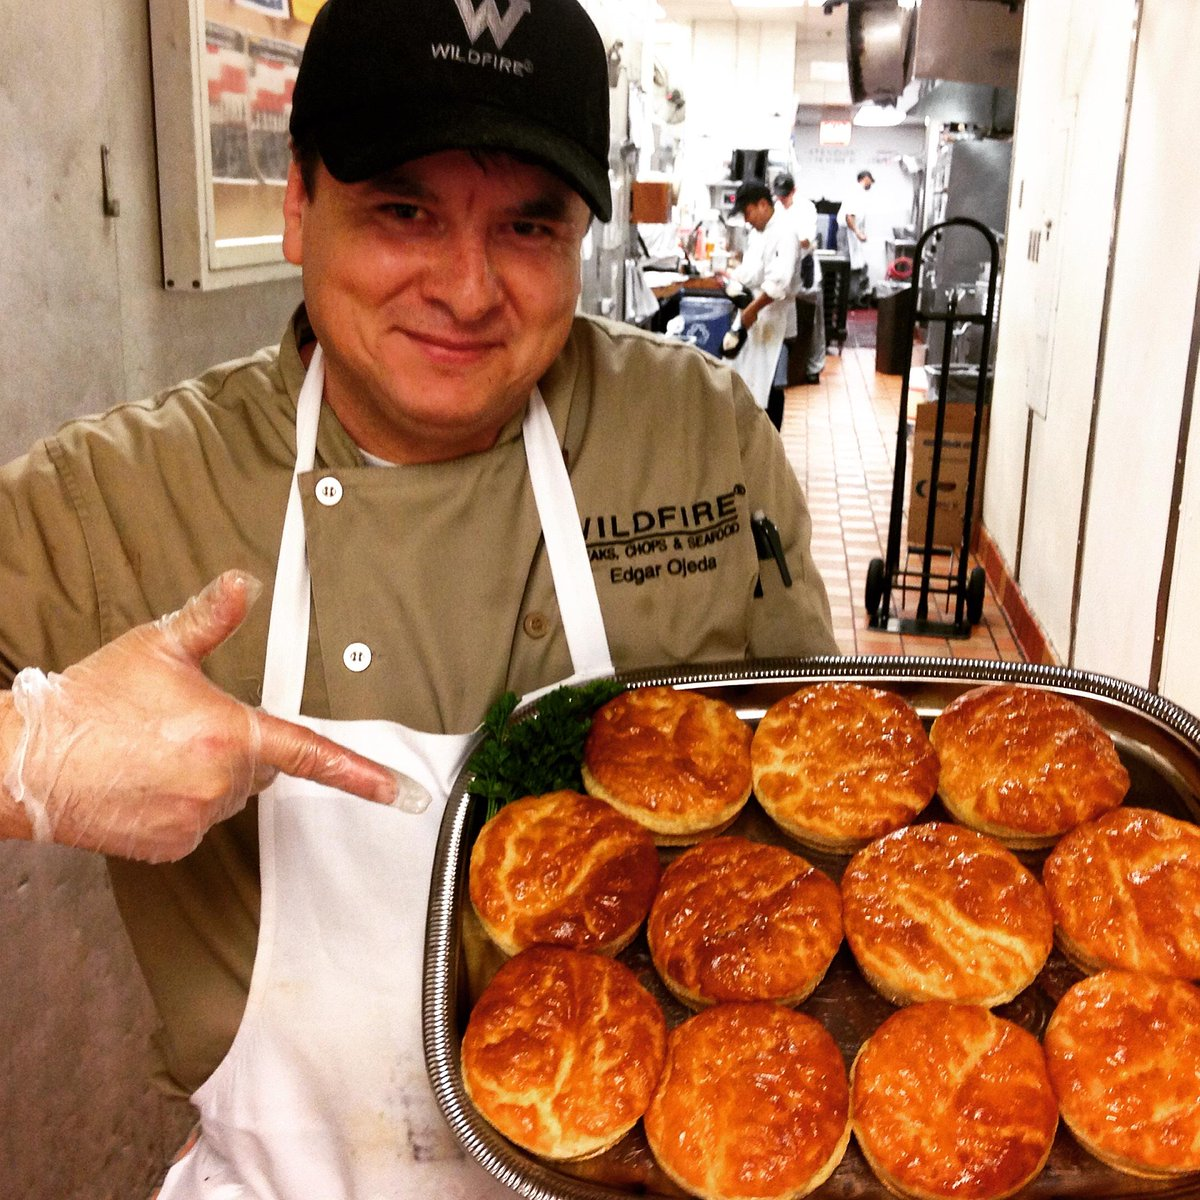 Free of gluten, full of flavor. #GlutenFreeChicago #GlutenFreeBread http://t.co/XQQBORad5Y http://t.co/zd8nGYHiu7